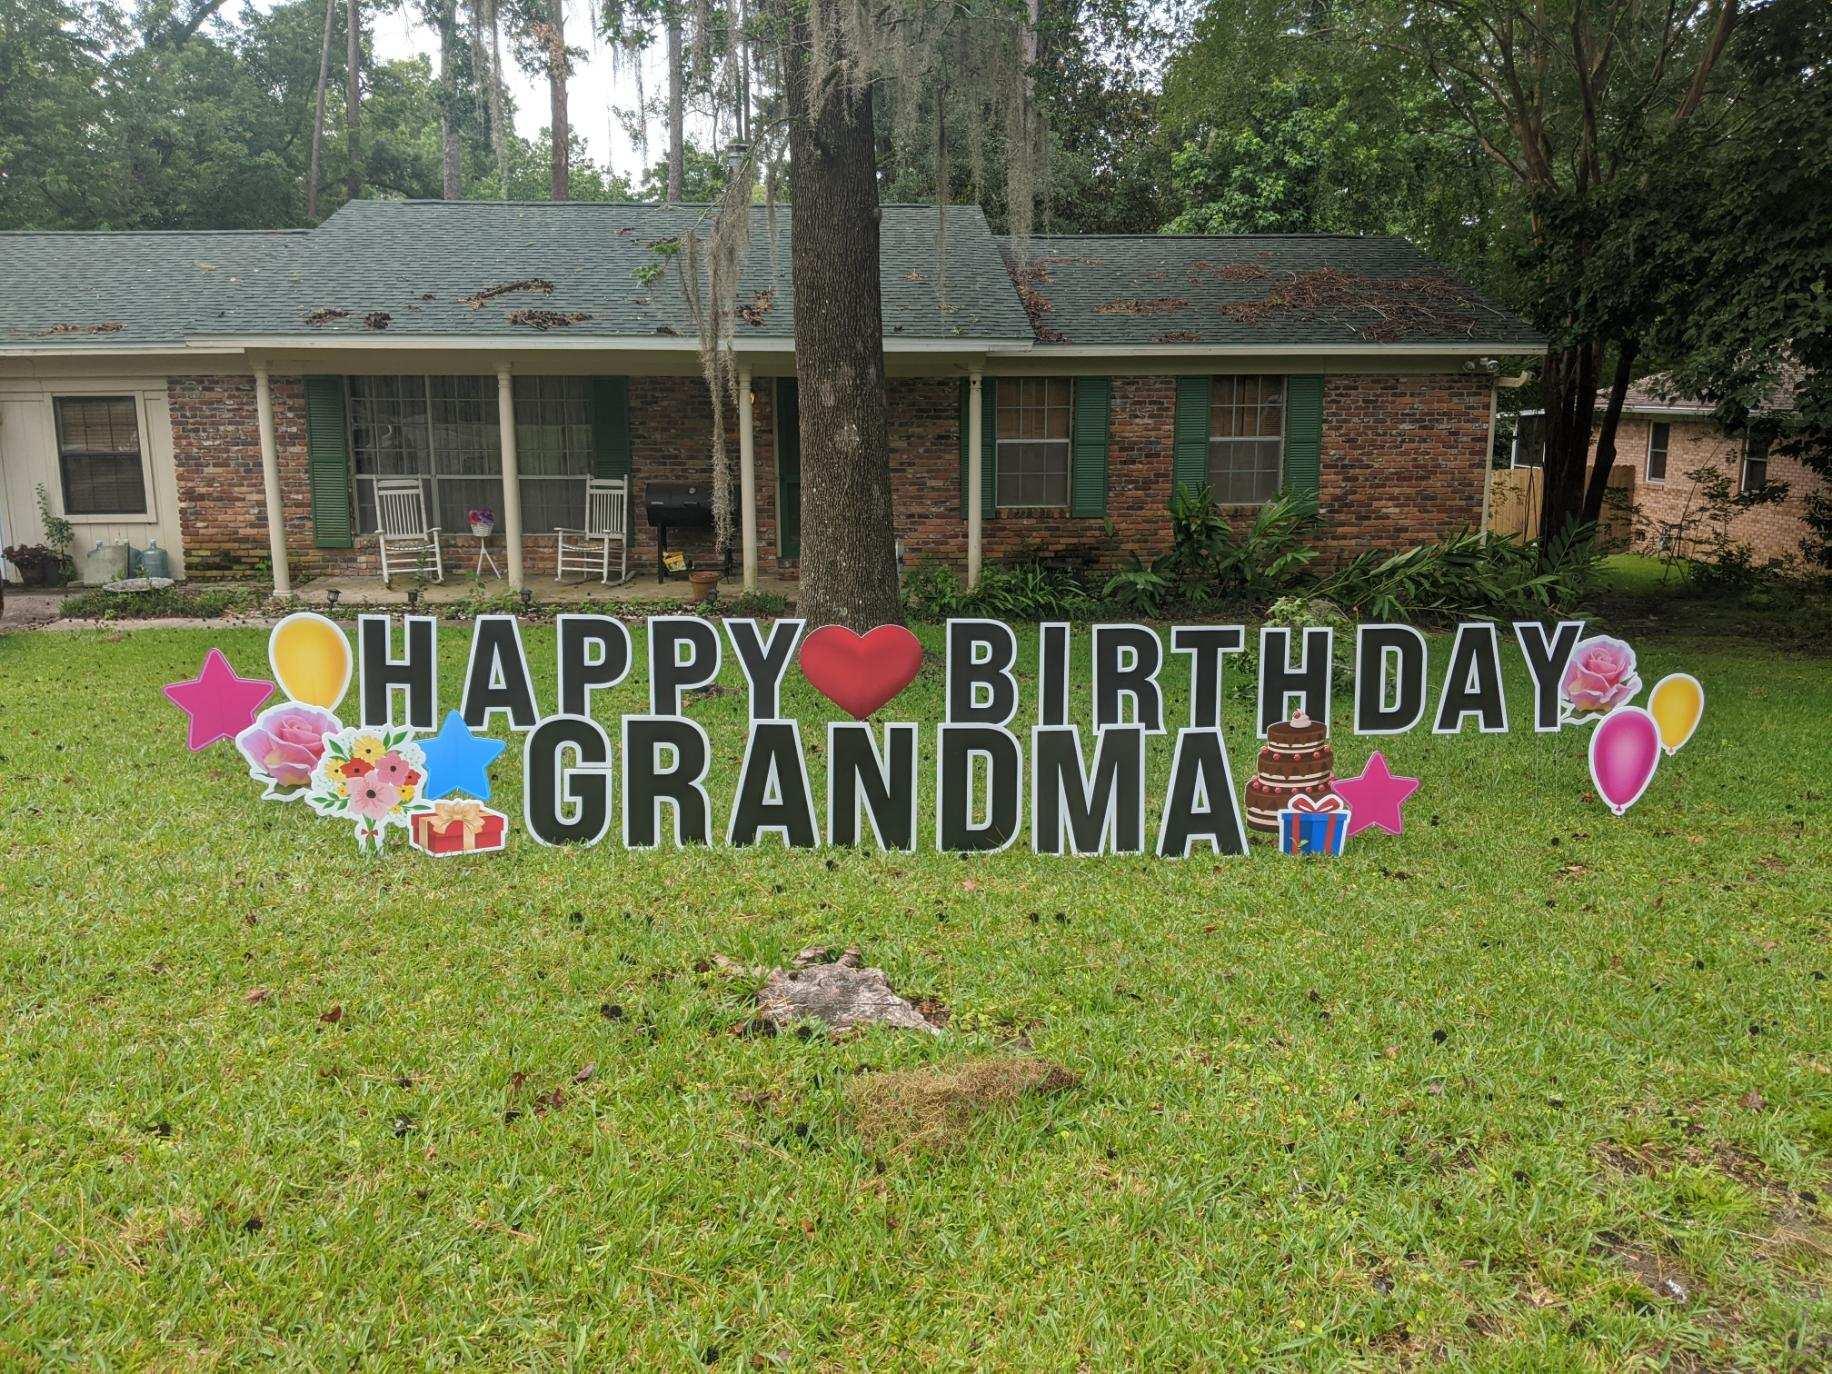 HBday Grandma